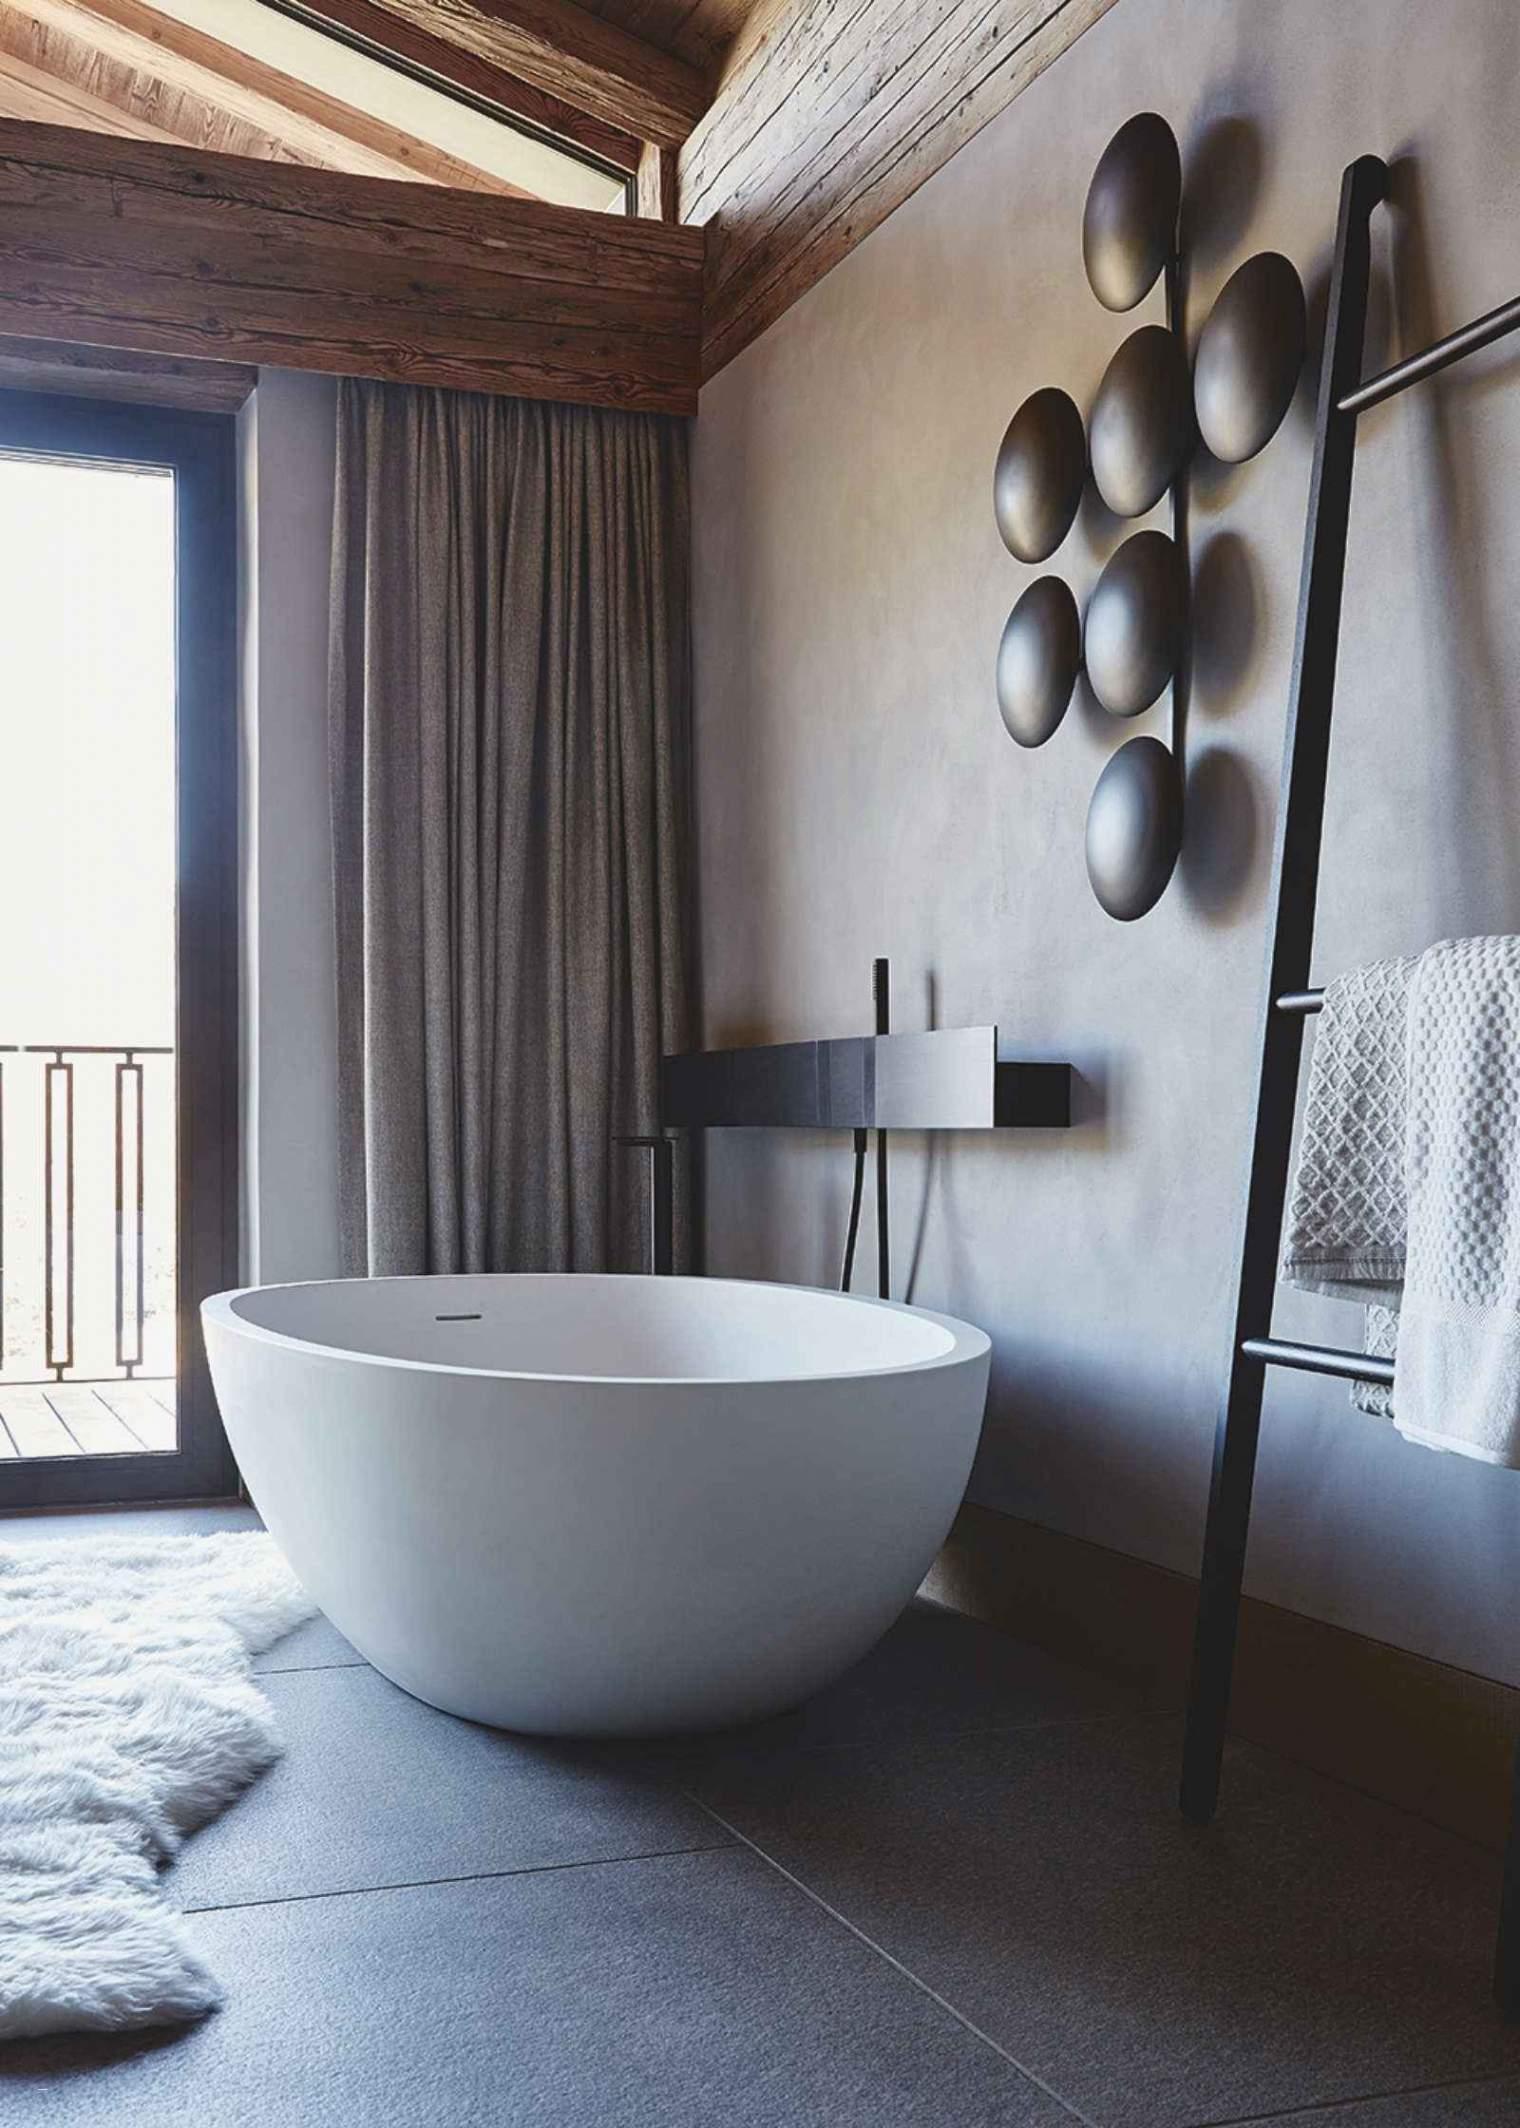 36 hervorragende grose badewanne badewanne am fenster badewanne am fenster